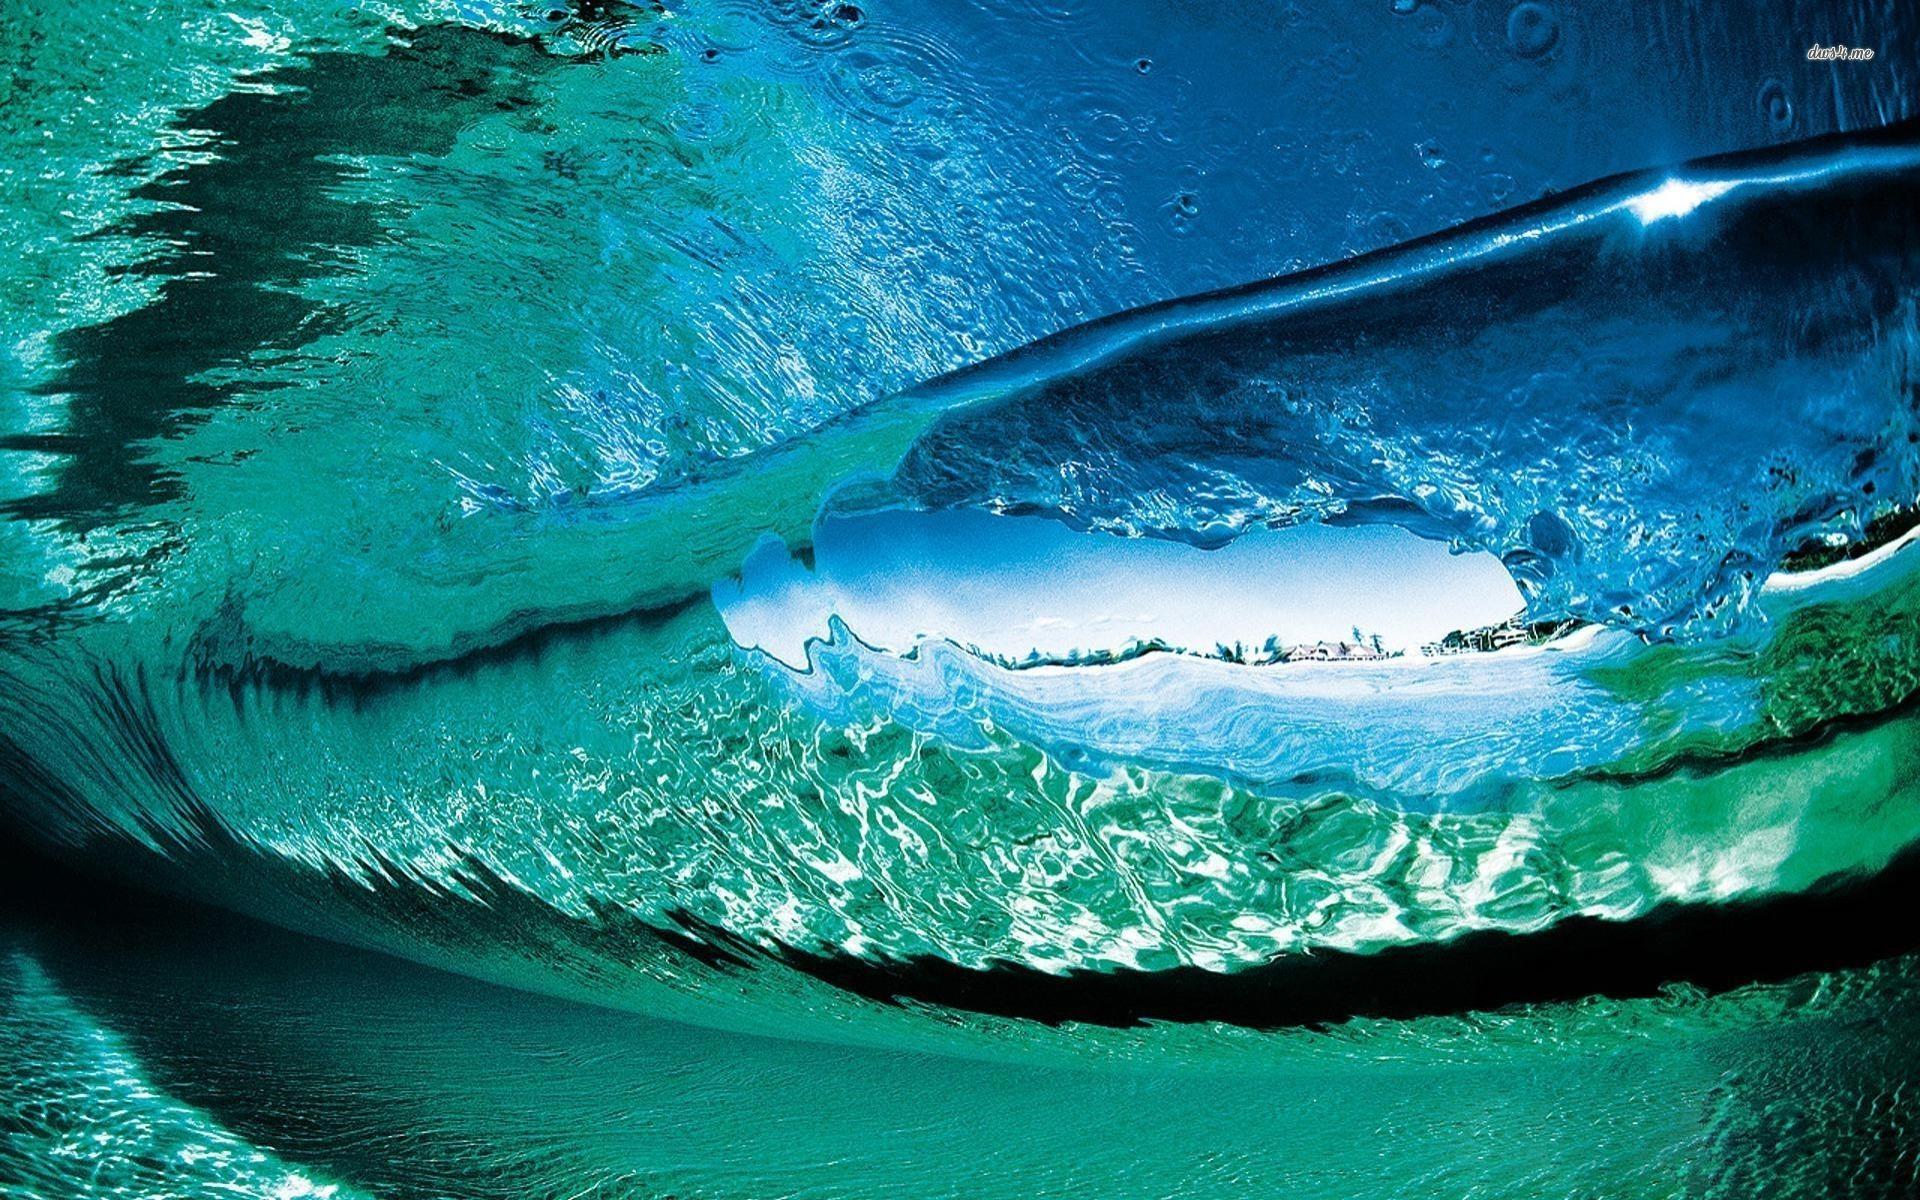 1920x1200 Ocean Waves Photography HD Desktop Wallpaper Wave